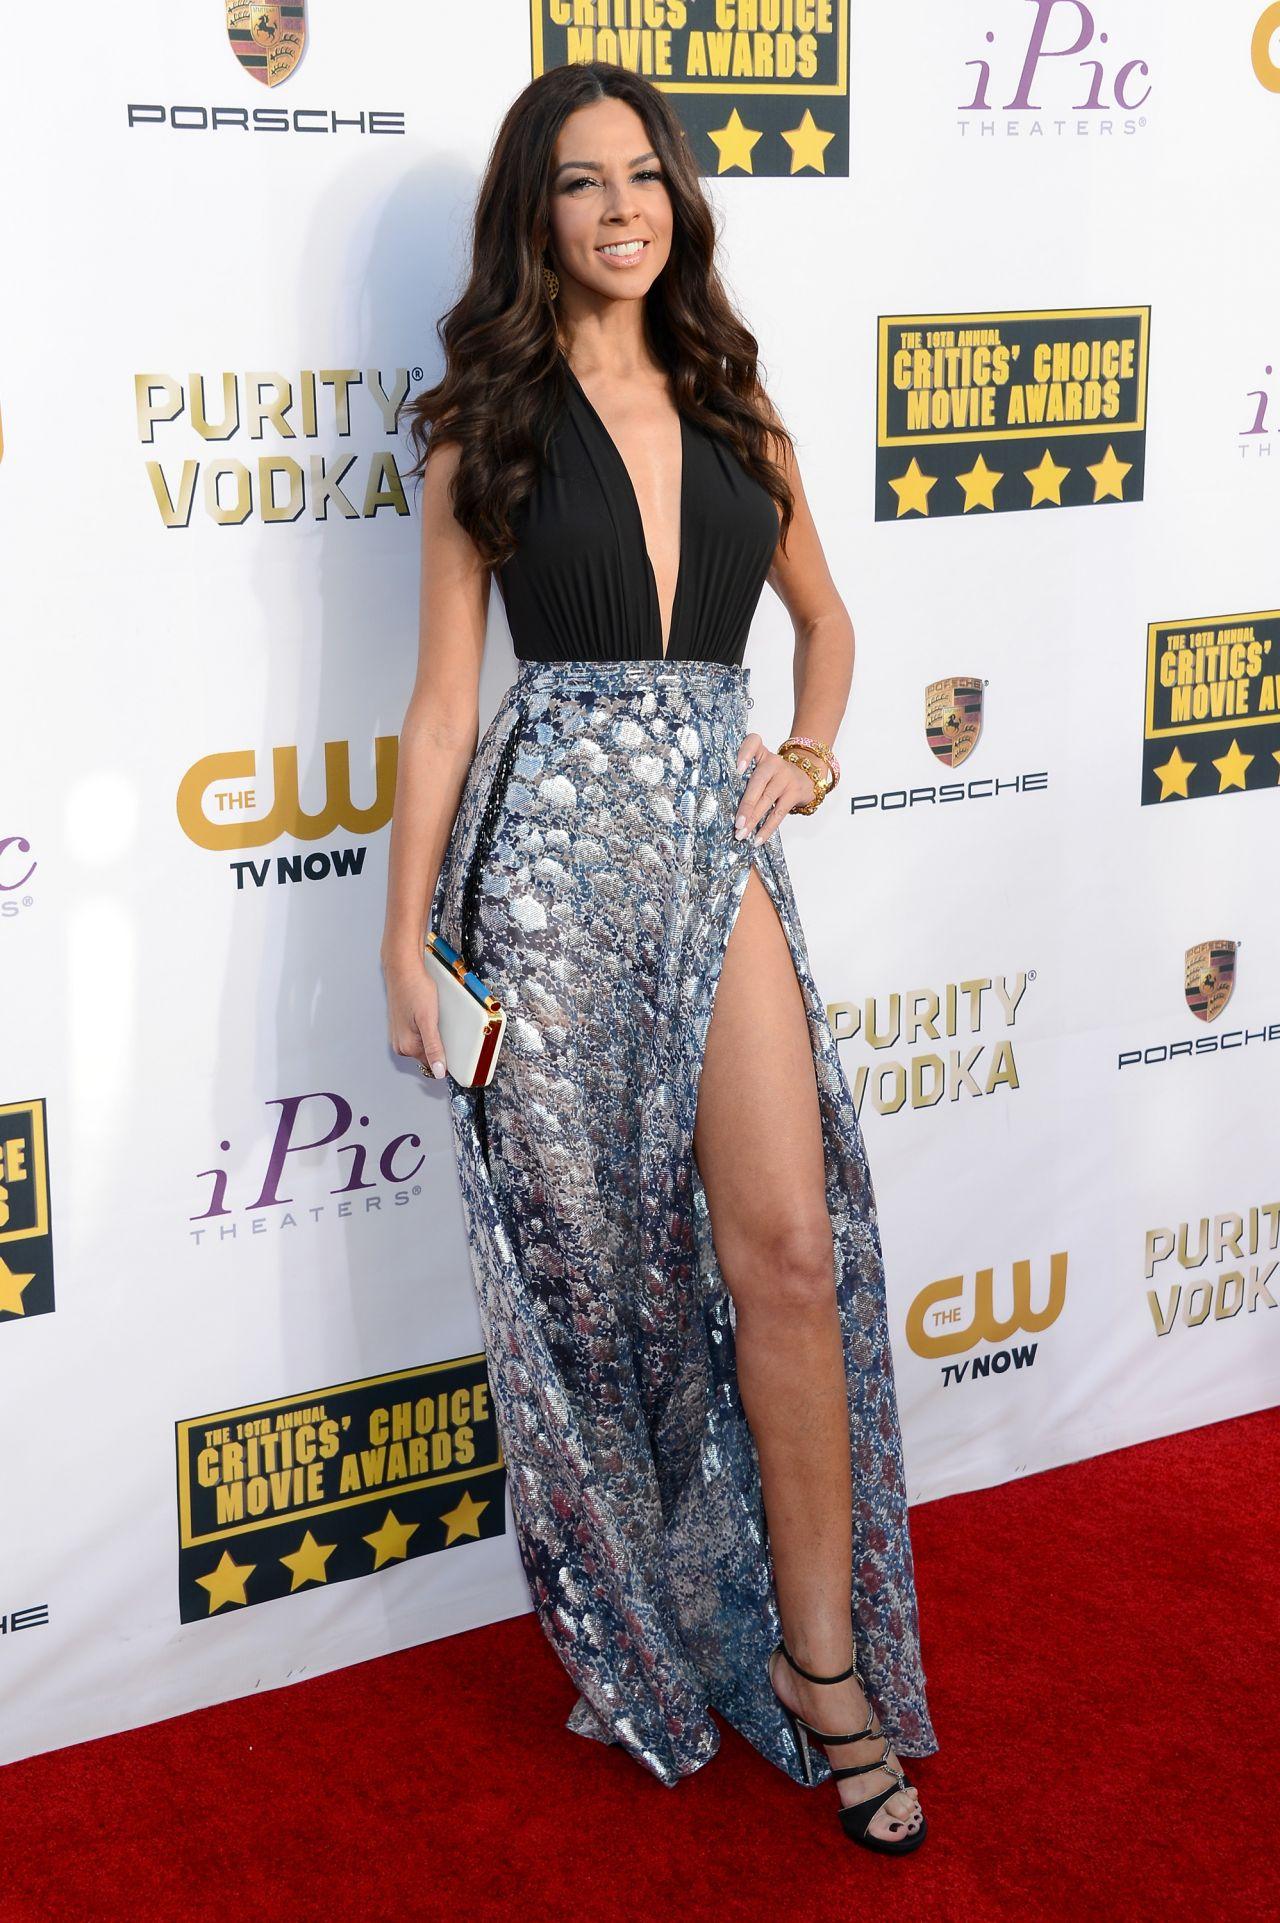 Critics Choice Movie Awards 2014